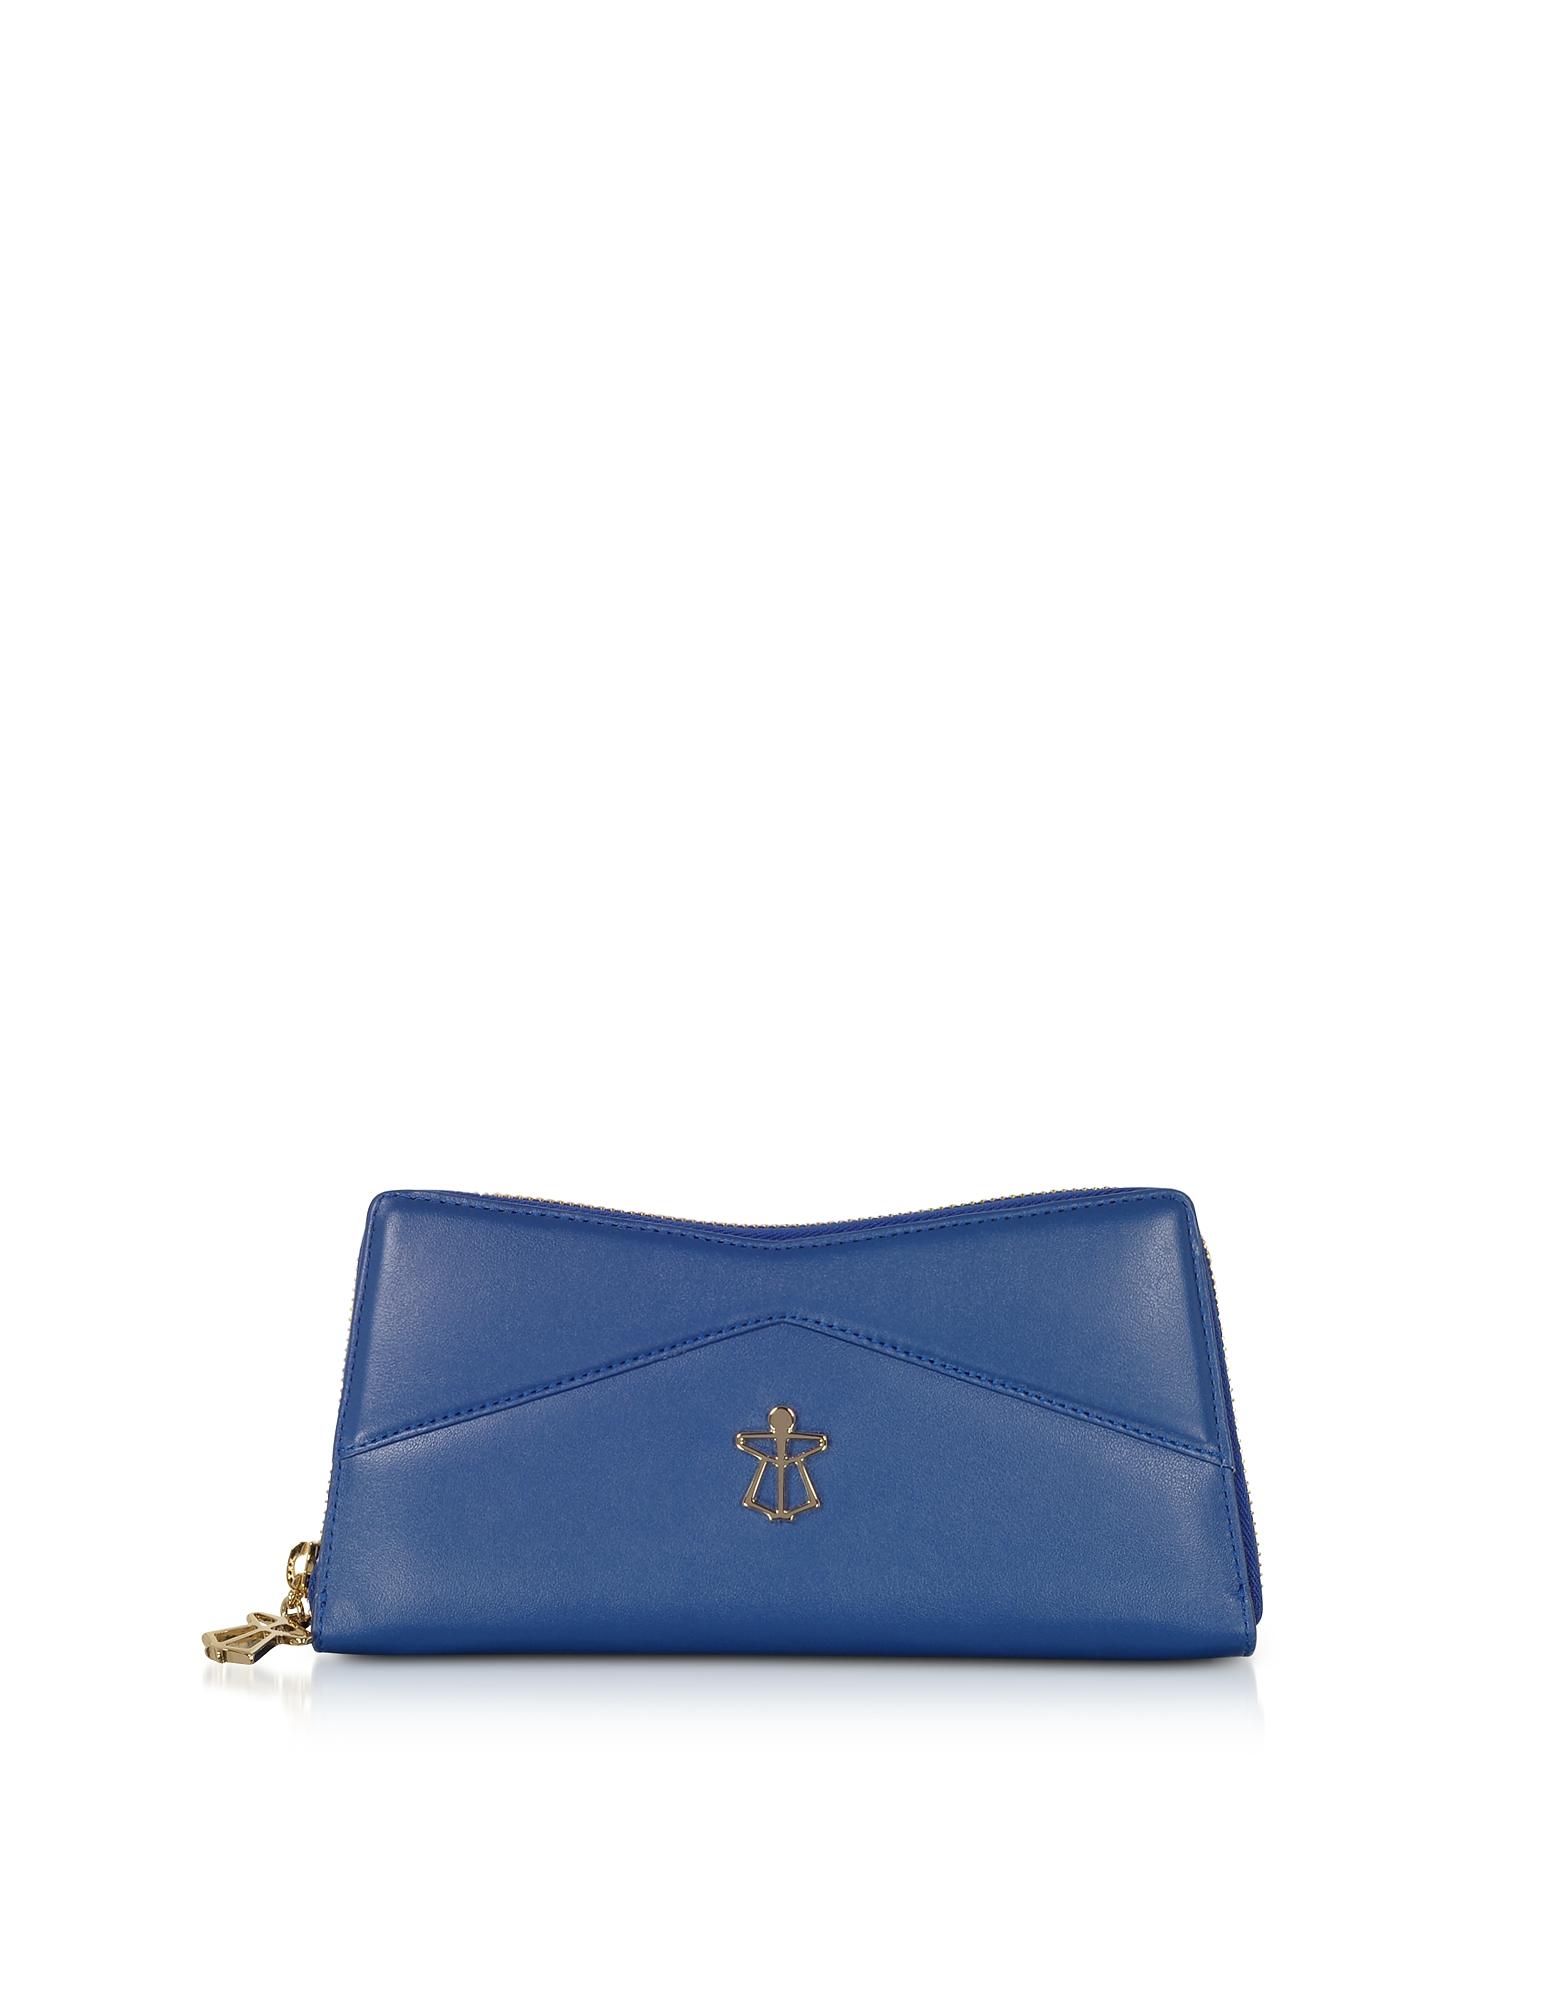 Lara Bellini  Handbags Zip Around Leather Continental Lara Wallet